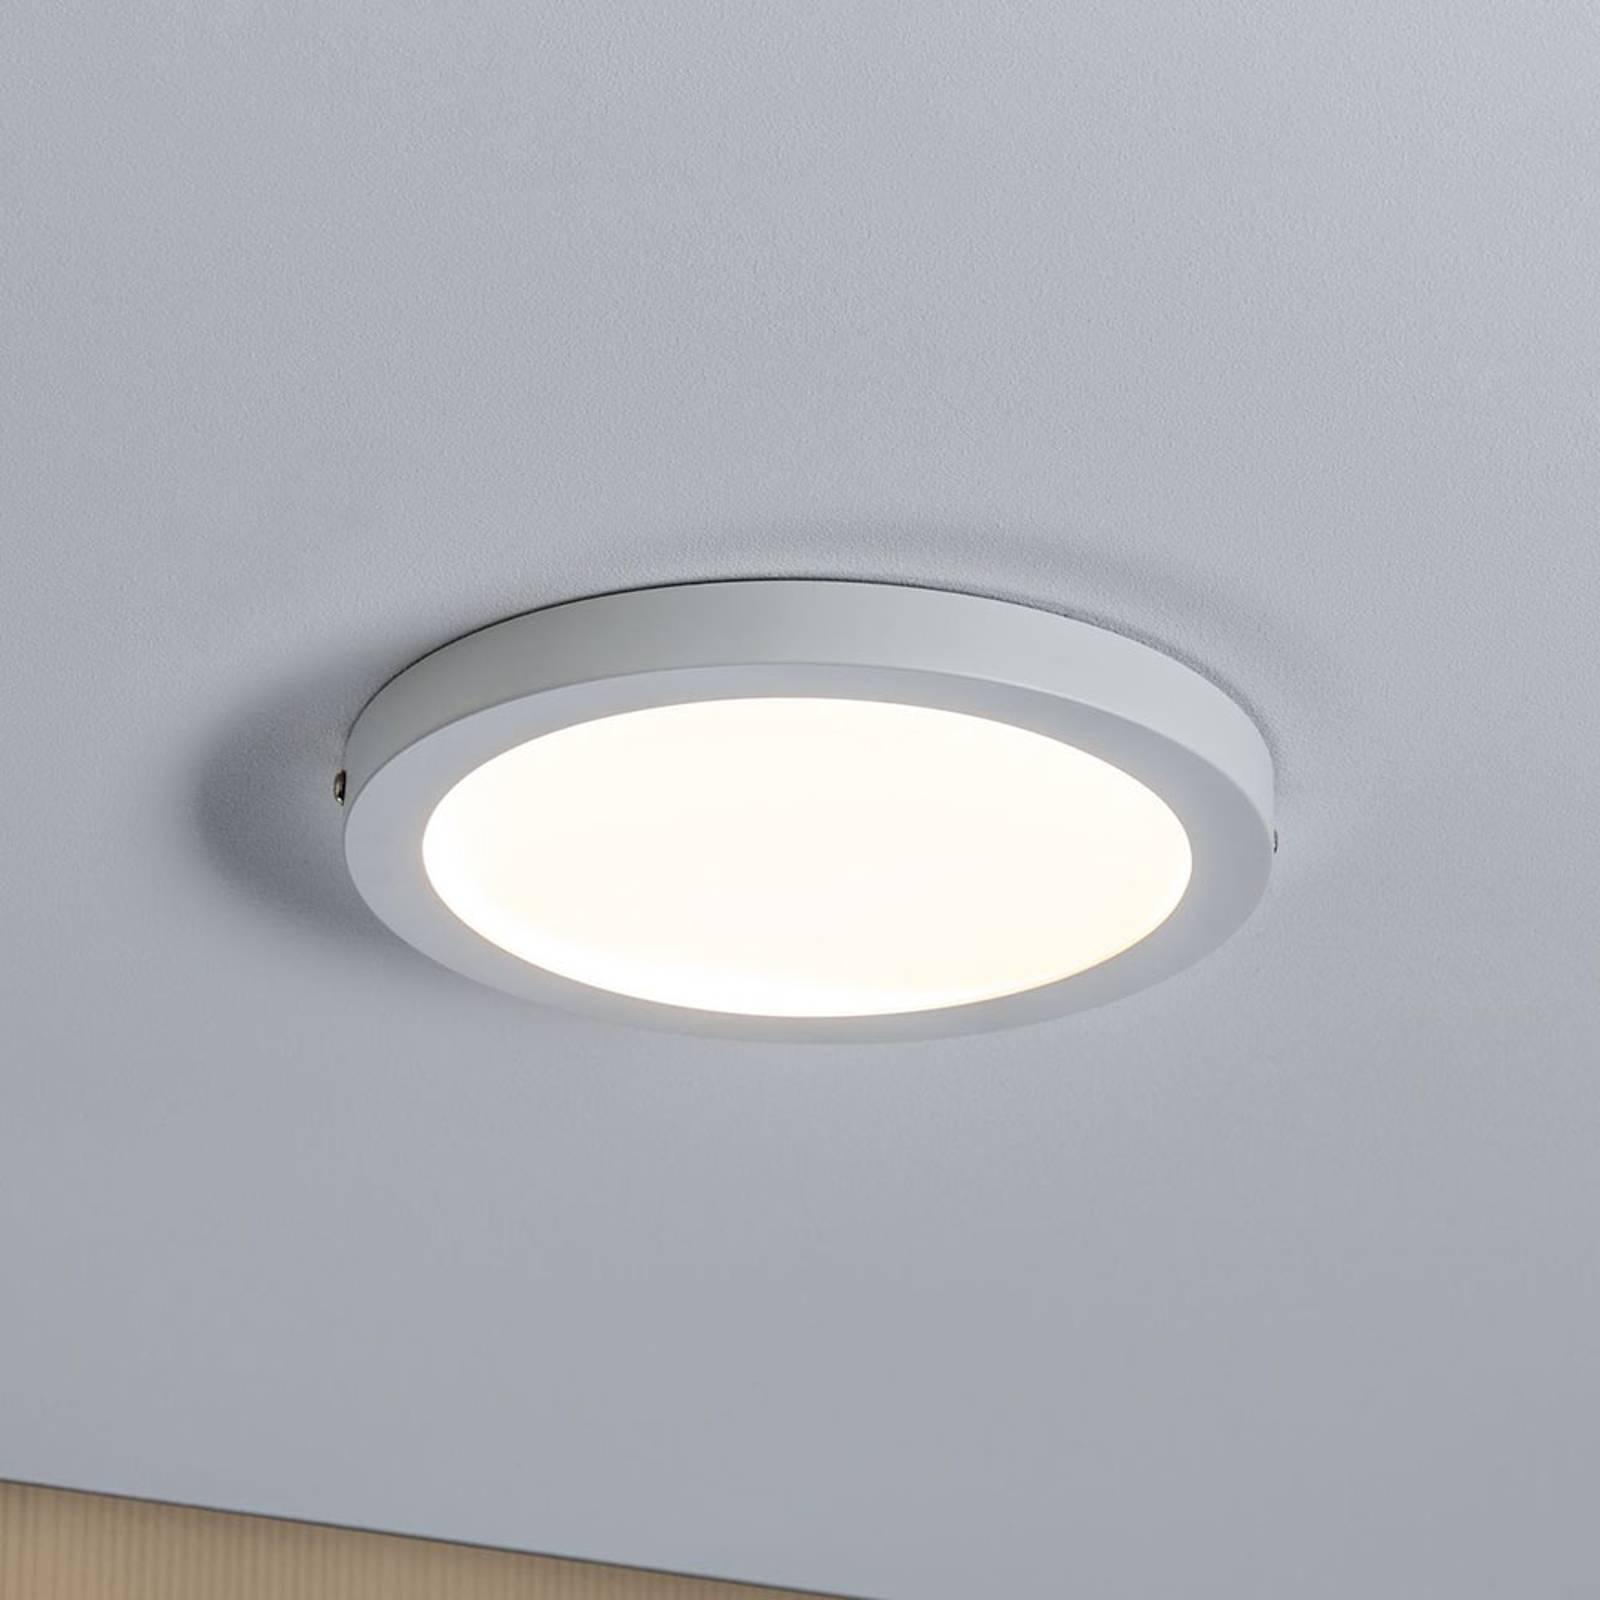 Paulmann Atria -LED-kattovalaisin Ø22cm